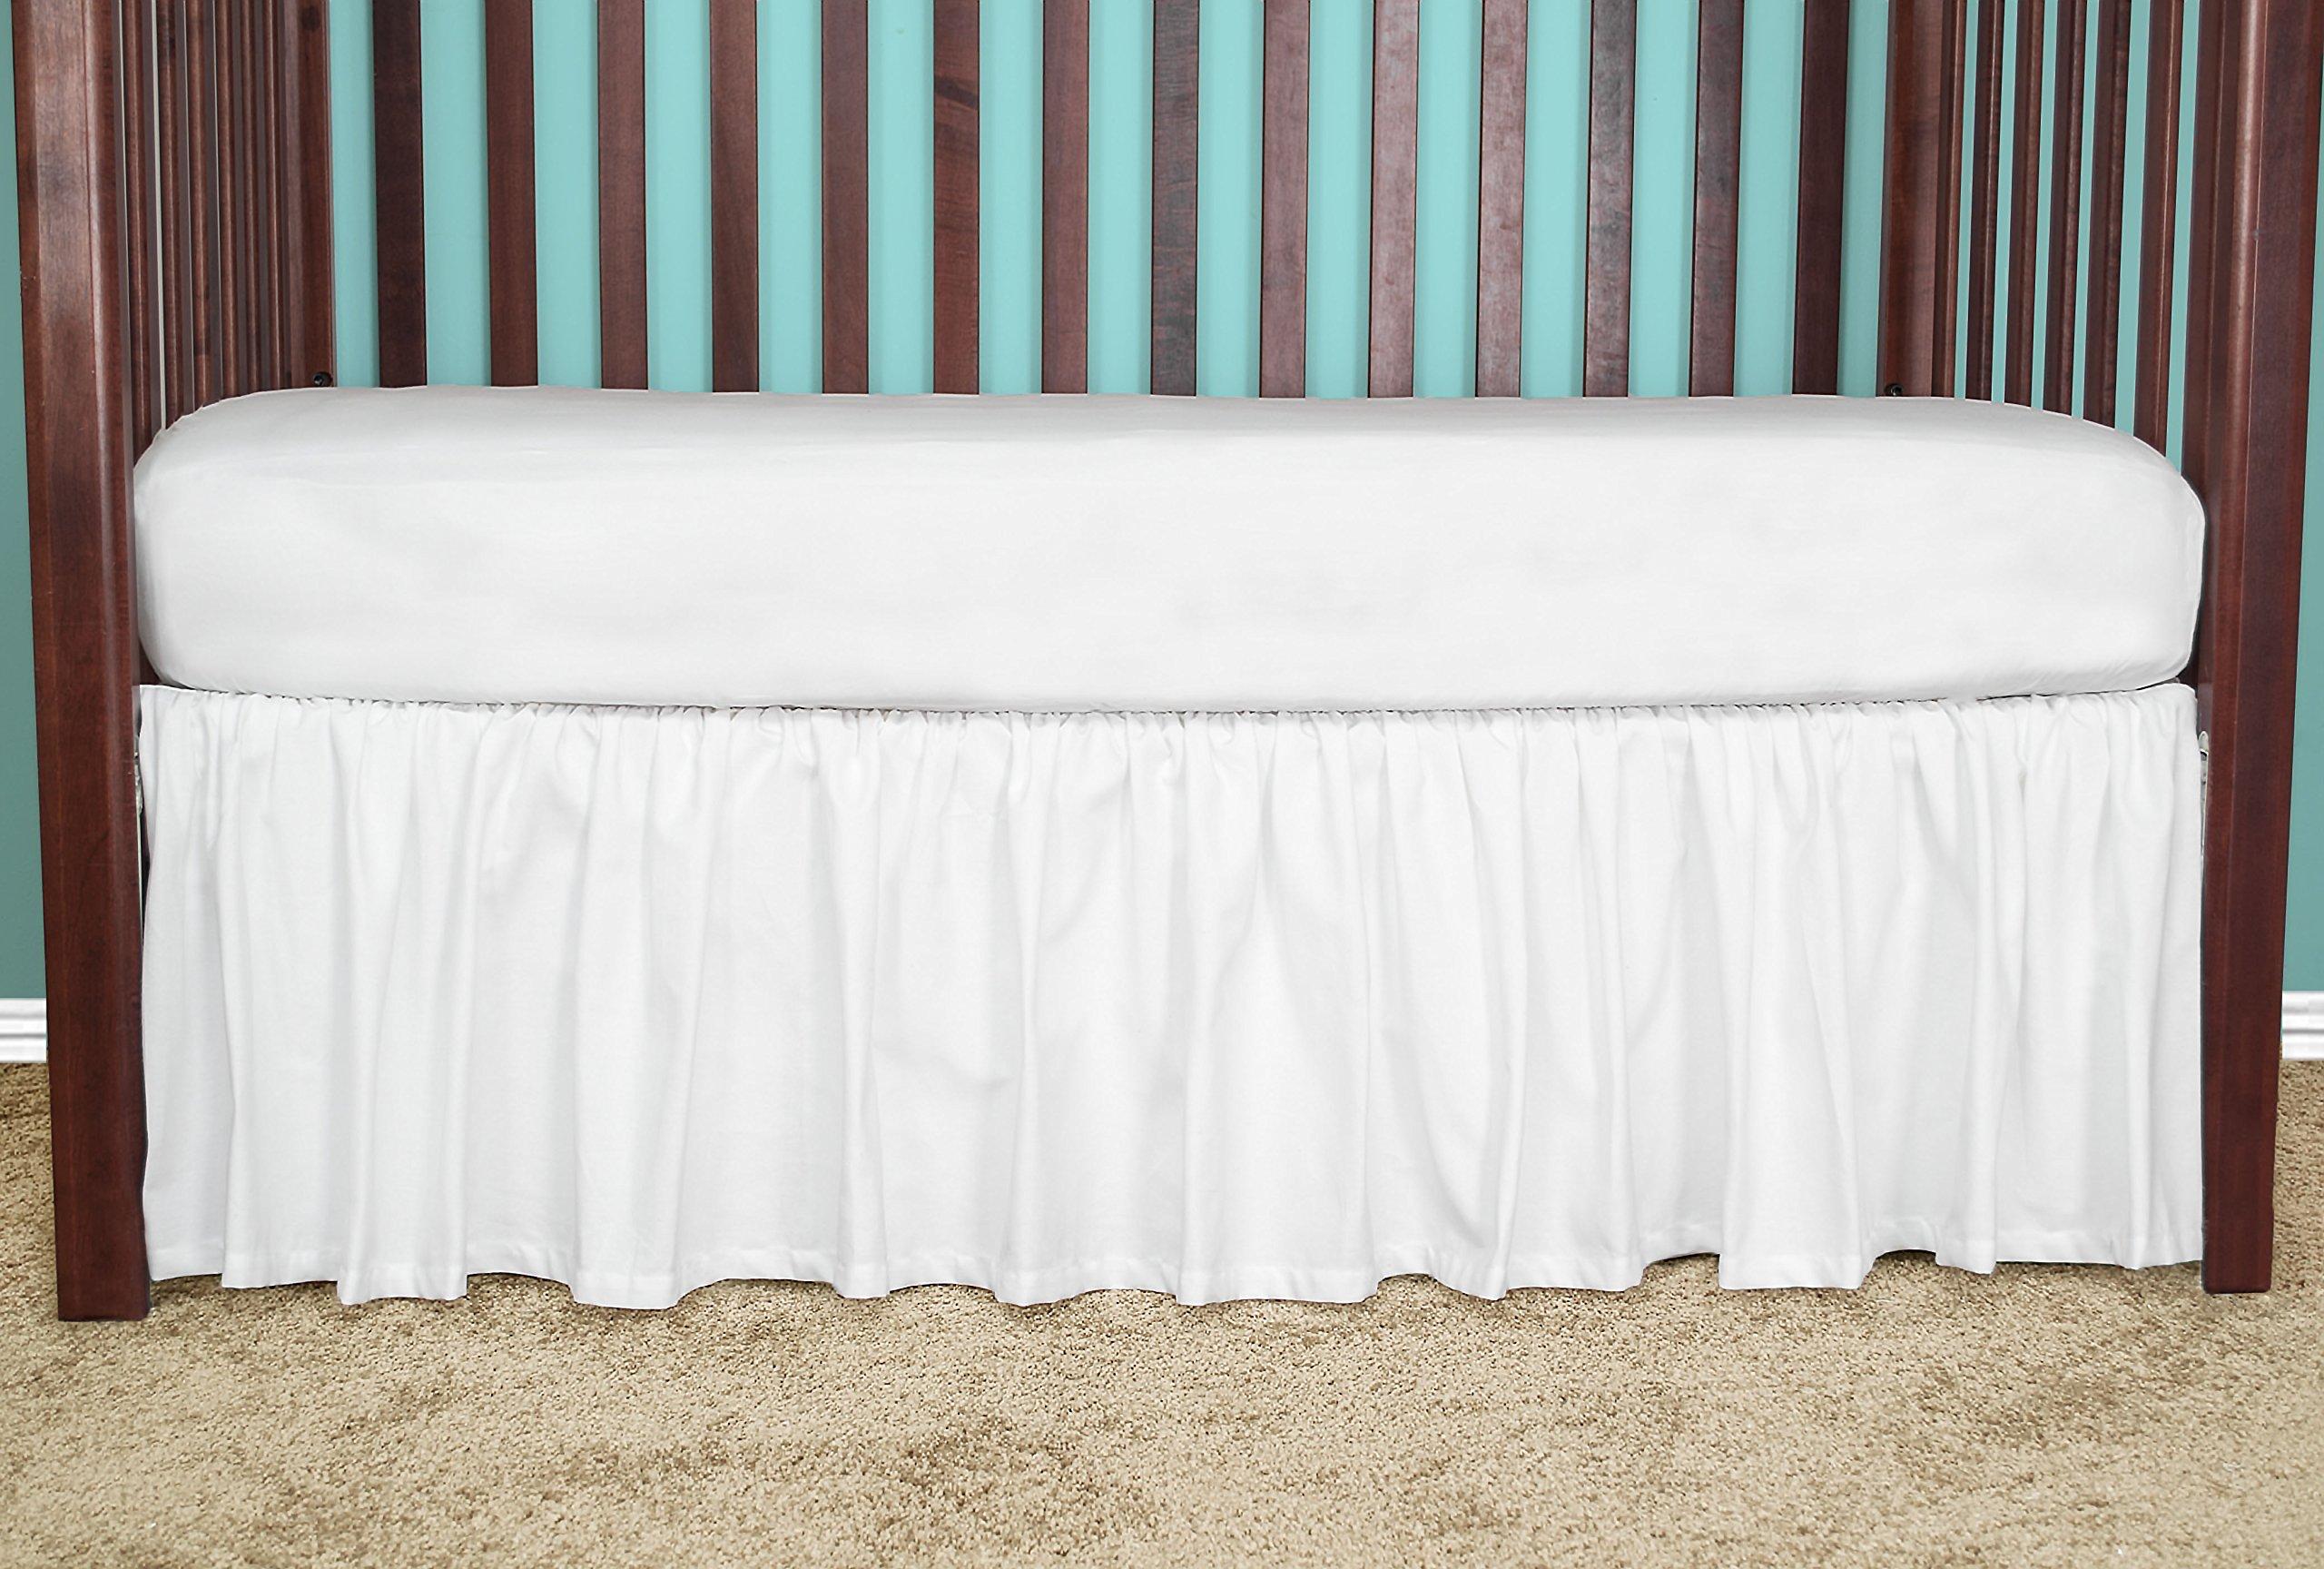 21 inch long WHITE Cribskirt Gathered Crib Dust Ruffle by Bobfriend